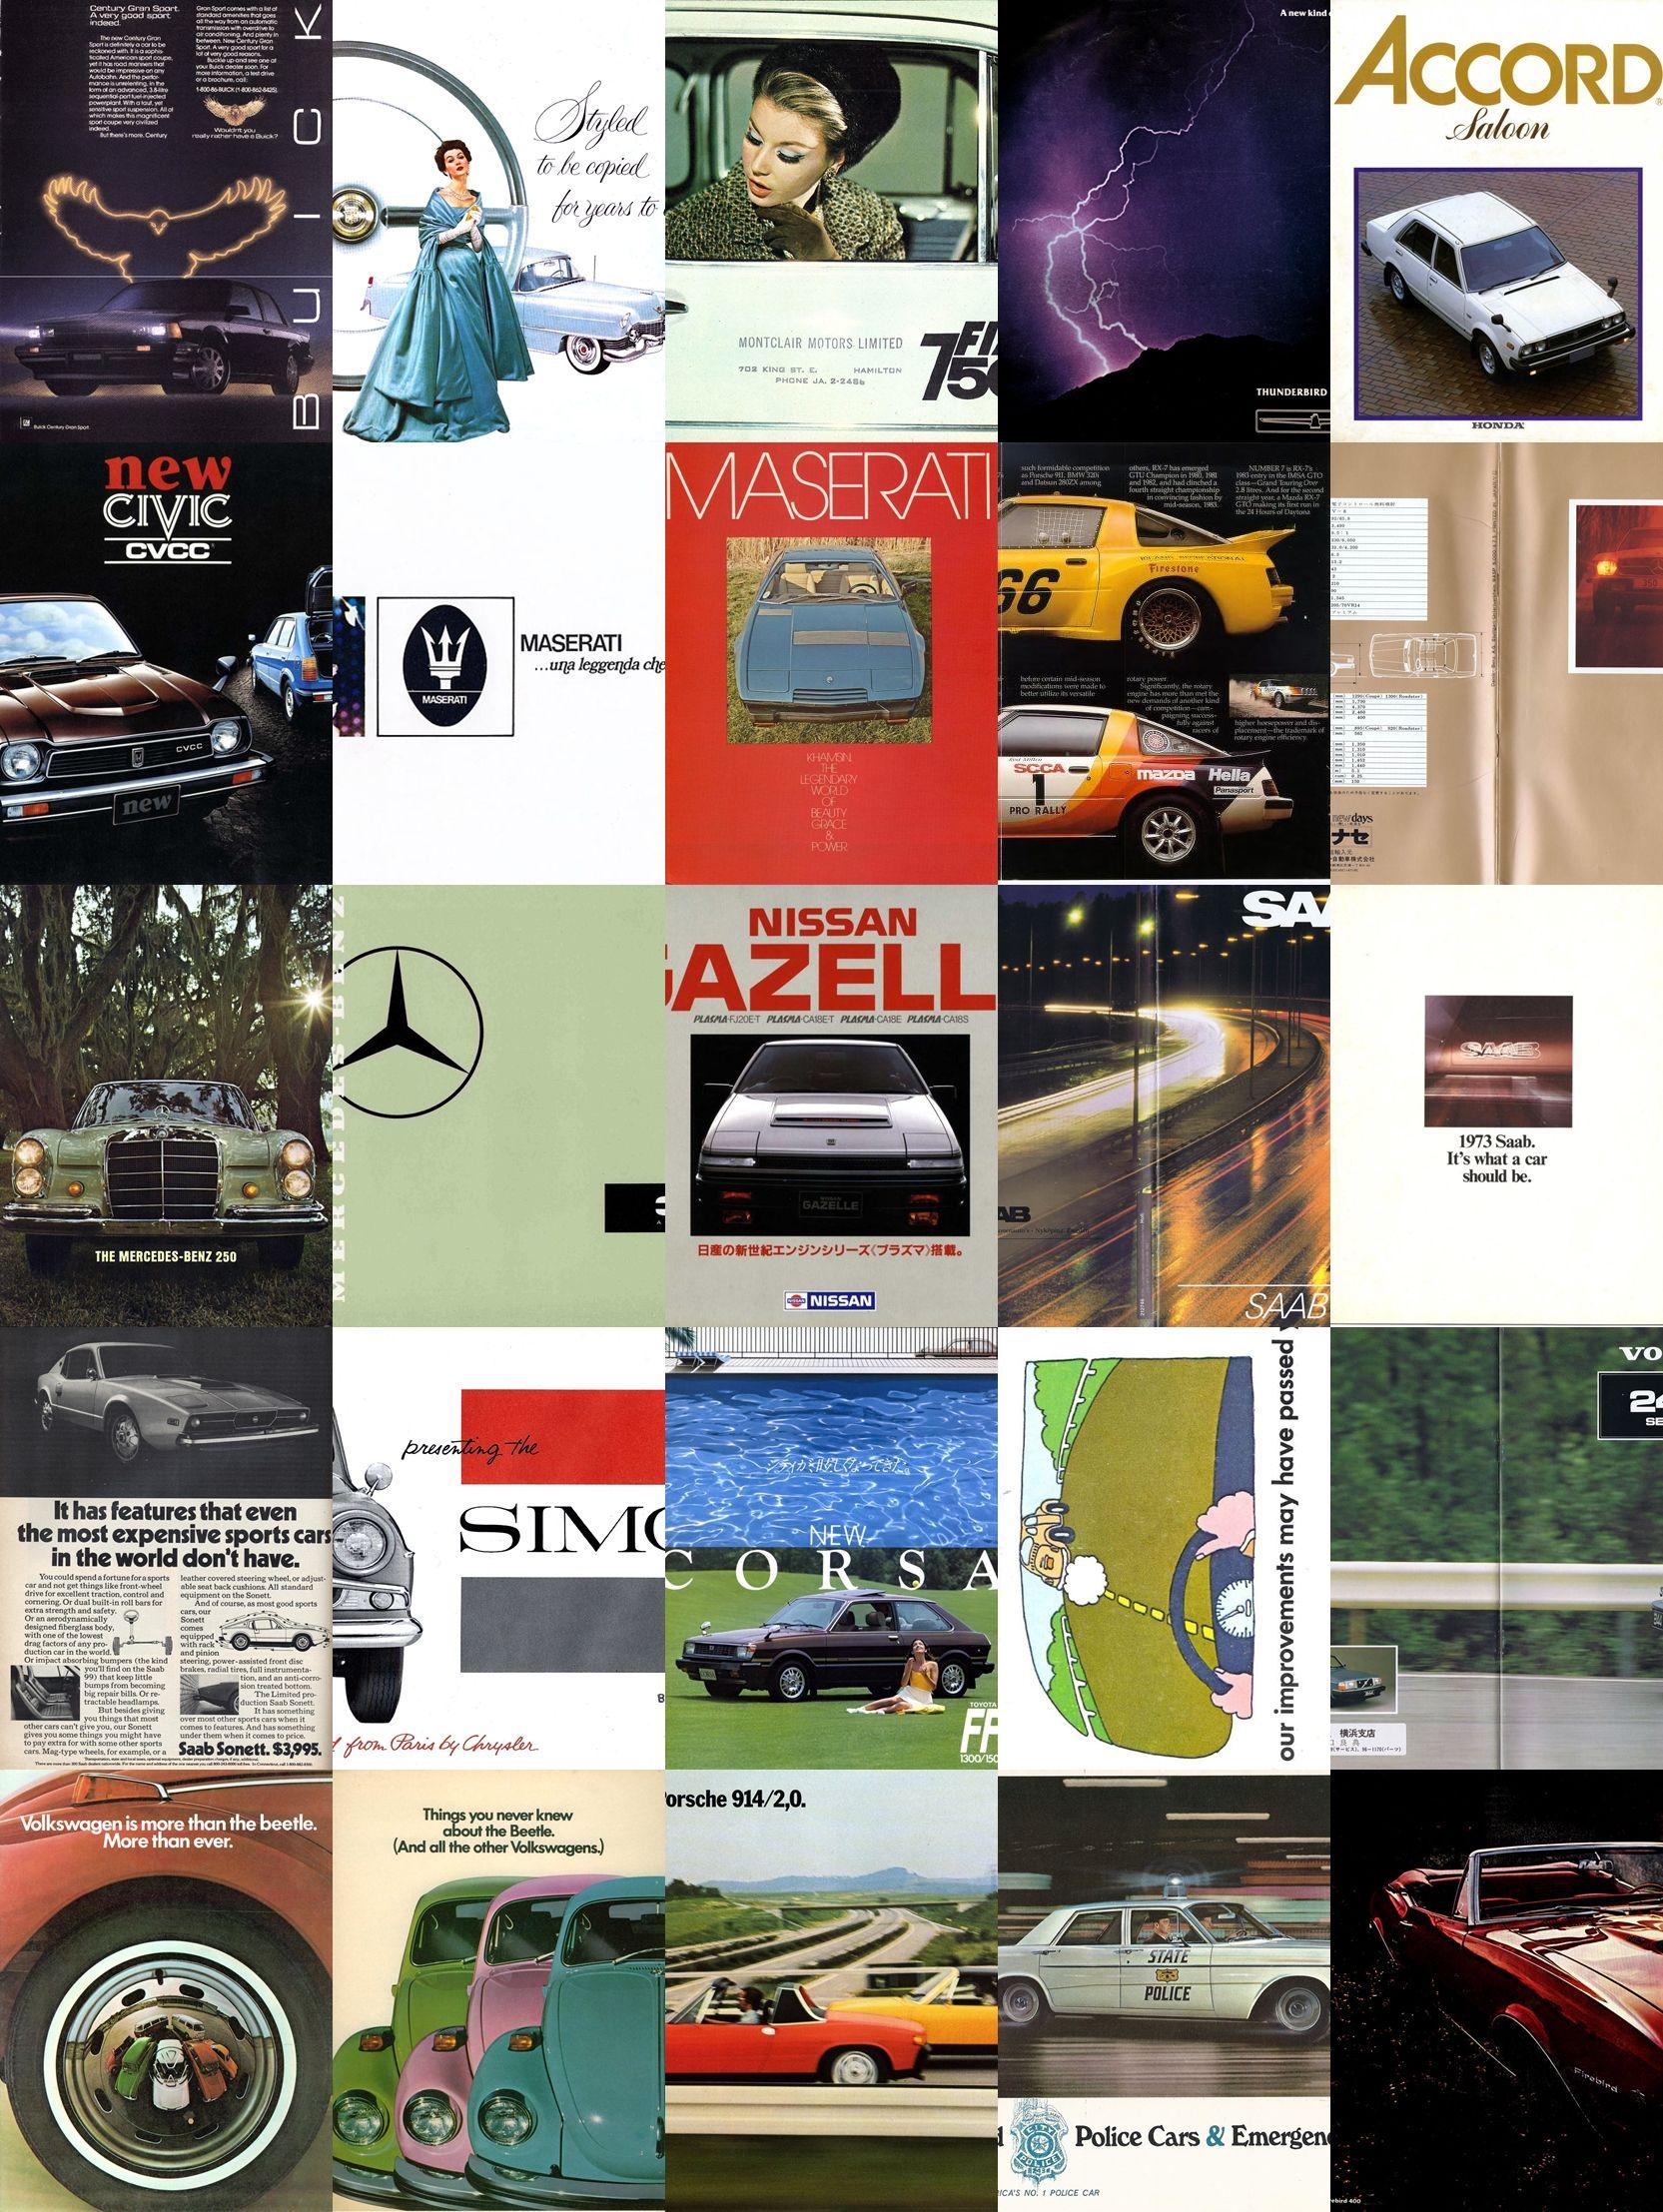 51 vintage car pdf brochures Buick, Cadillac, Maserati, Pontiac, Mercedes, Saab,